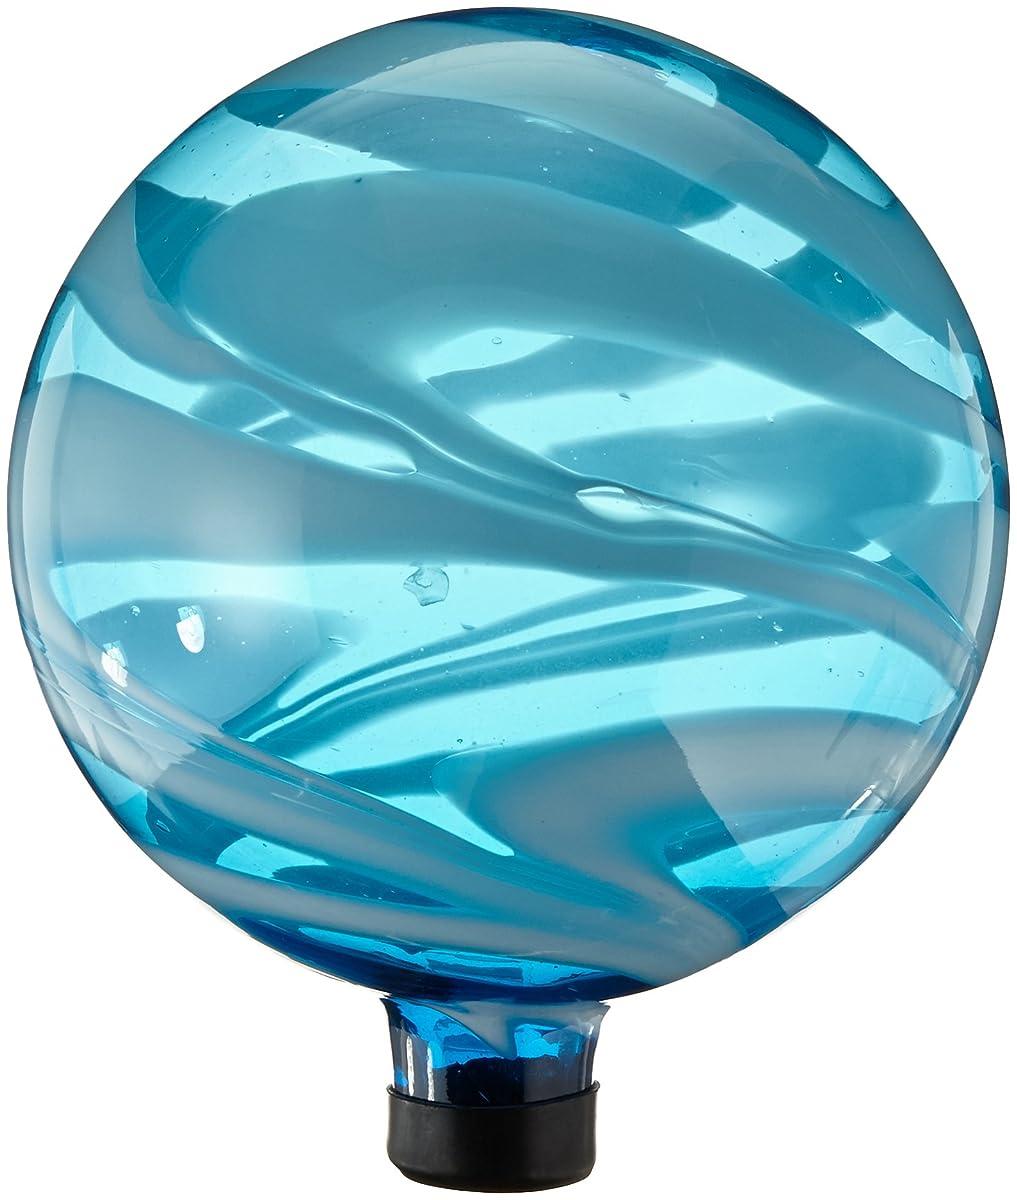 "Gardeners Select A14BFG05 Glass Gazing Globe, Blue and White Swirl, 10"""